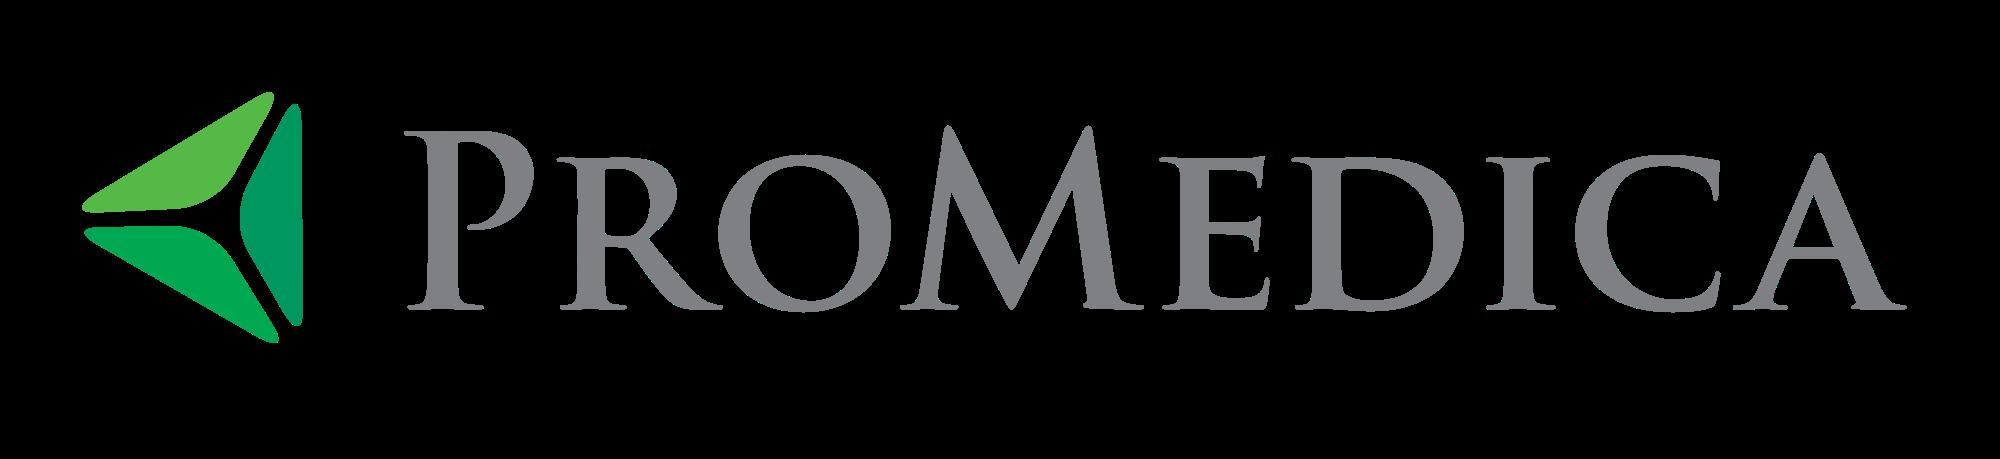 2000px-Promedica_Logo_svg_.png